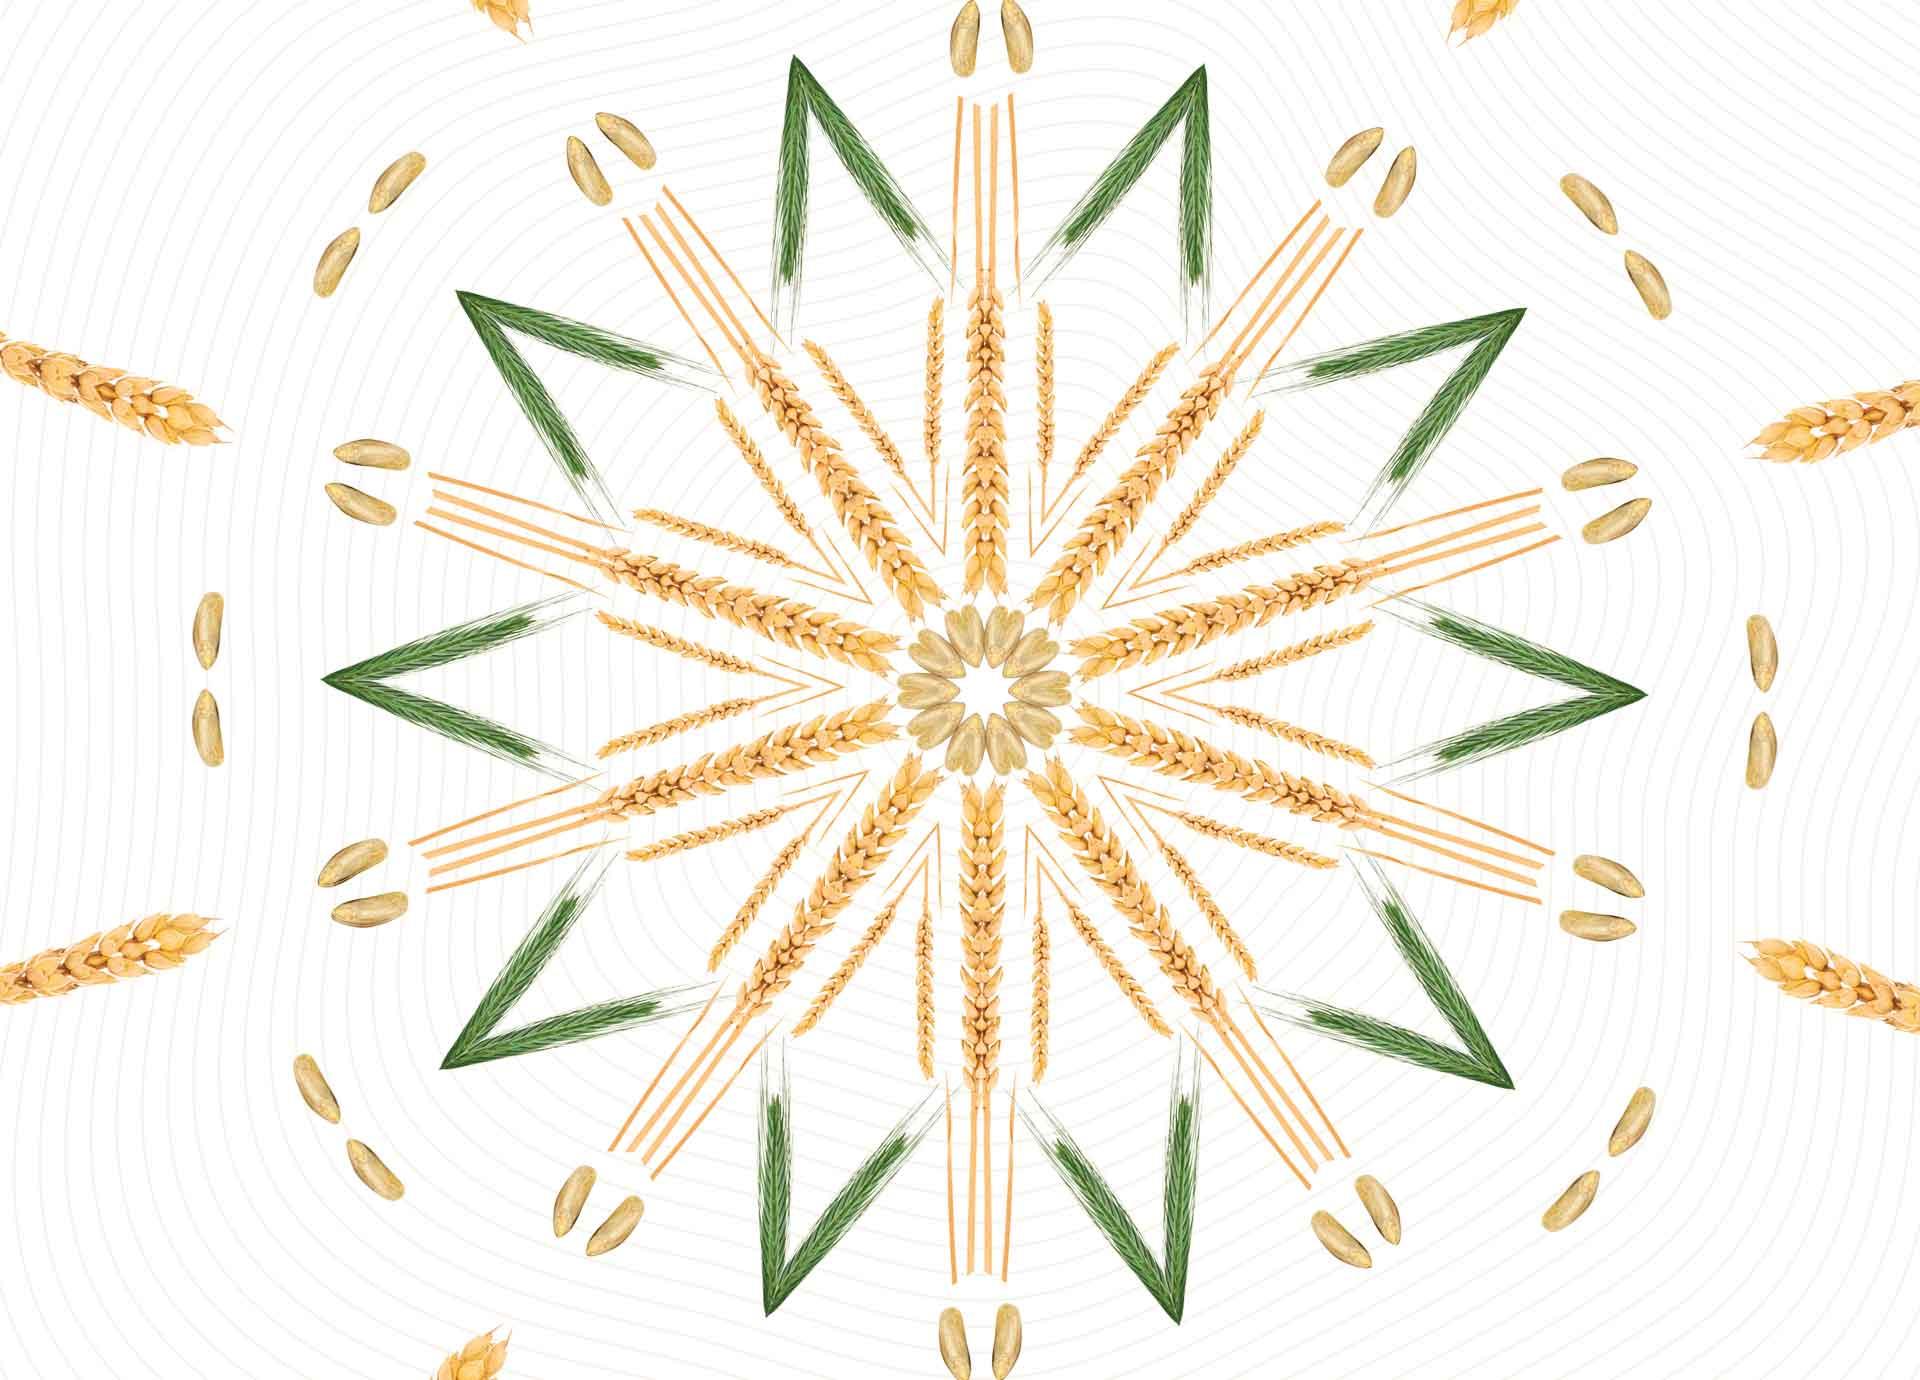 3_gero-apetito_PAKUOTES_kaleidoskopas_1920X1380-maz